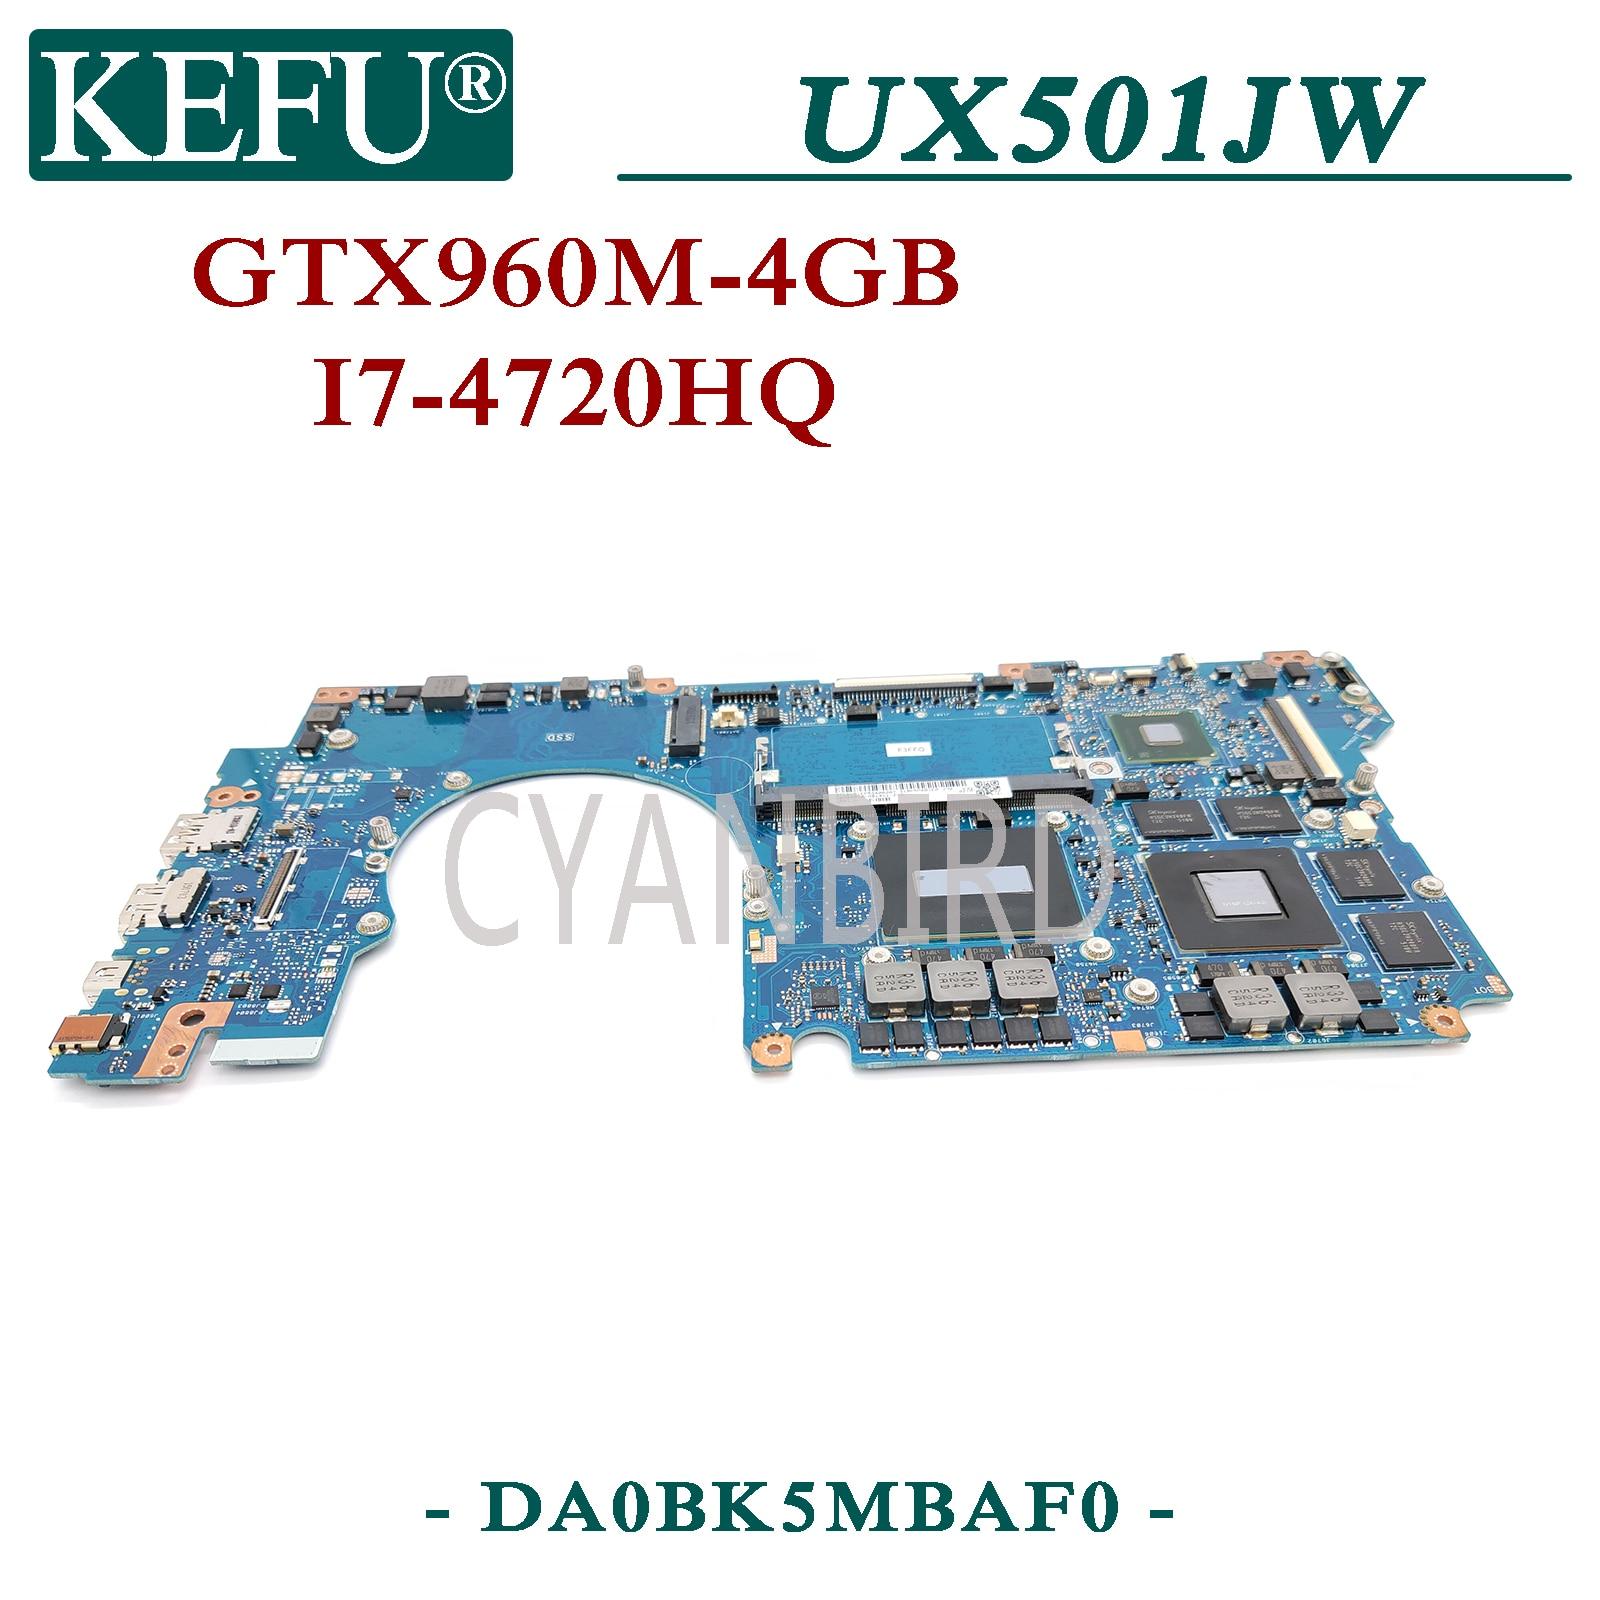 KEFU DA0BK5MBAF0 اللوحة الأصلية ل ASUS UX501JW UX501J N501JW N501J مع 4GB-RAM I7-4720HQ GTX960M-4GB اللوحة المحمول